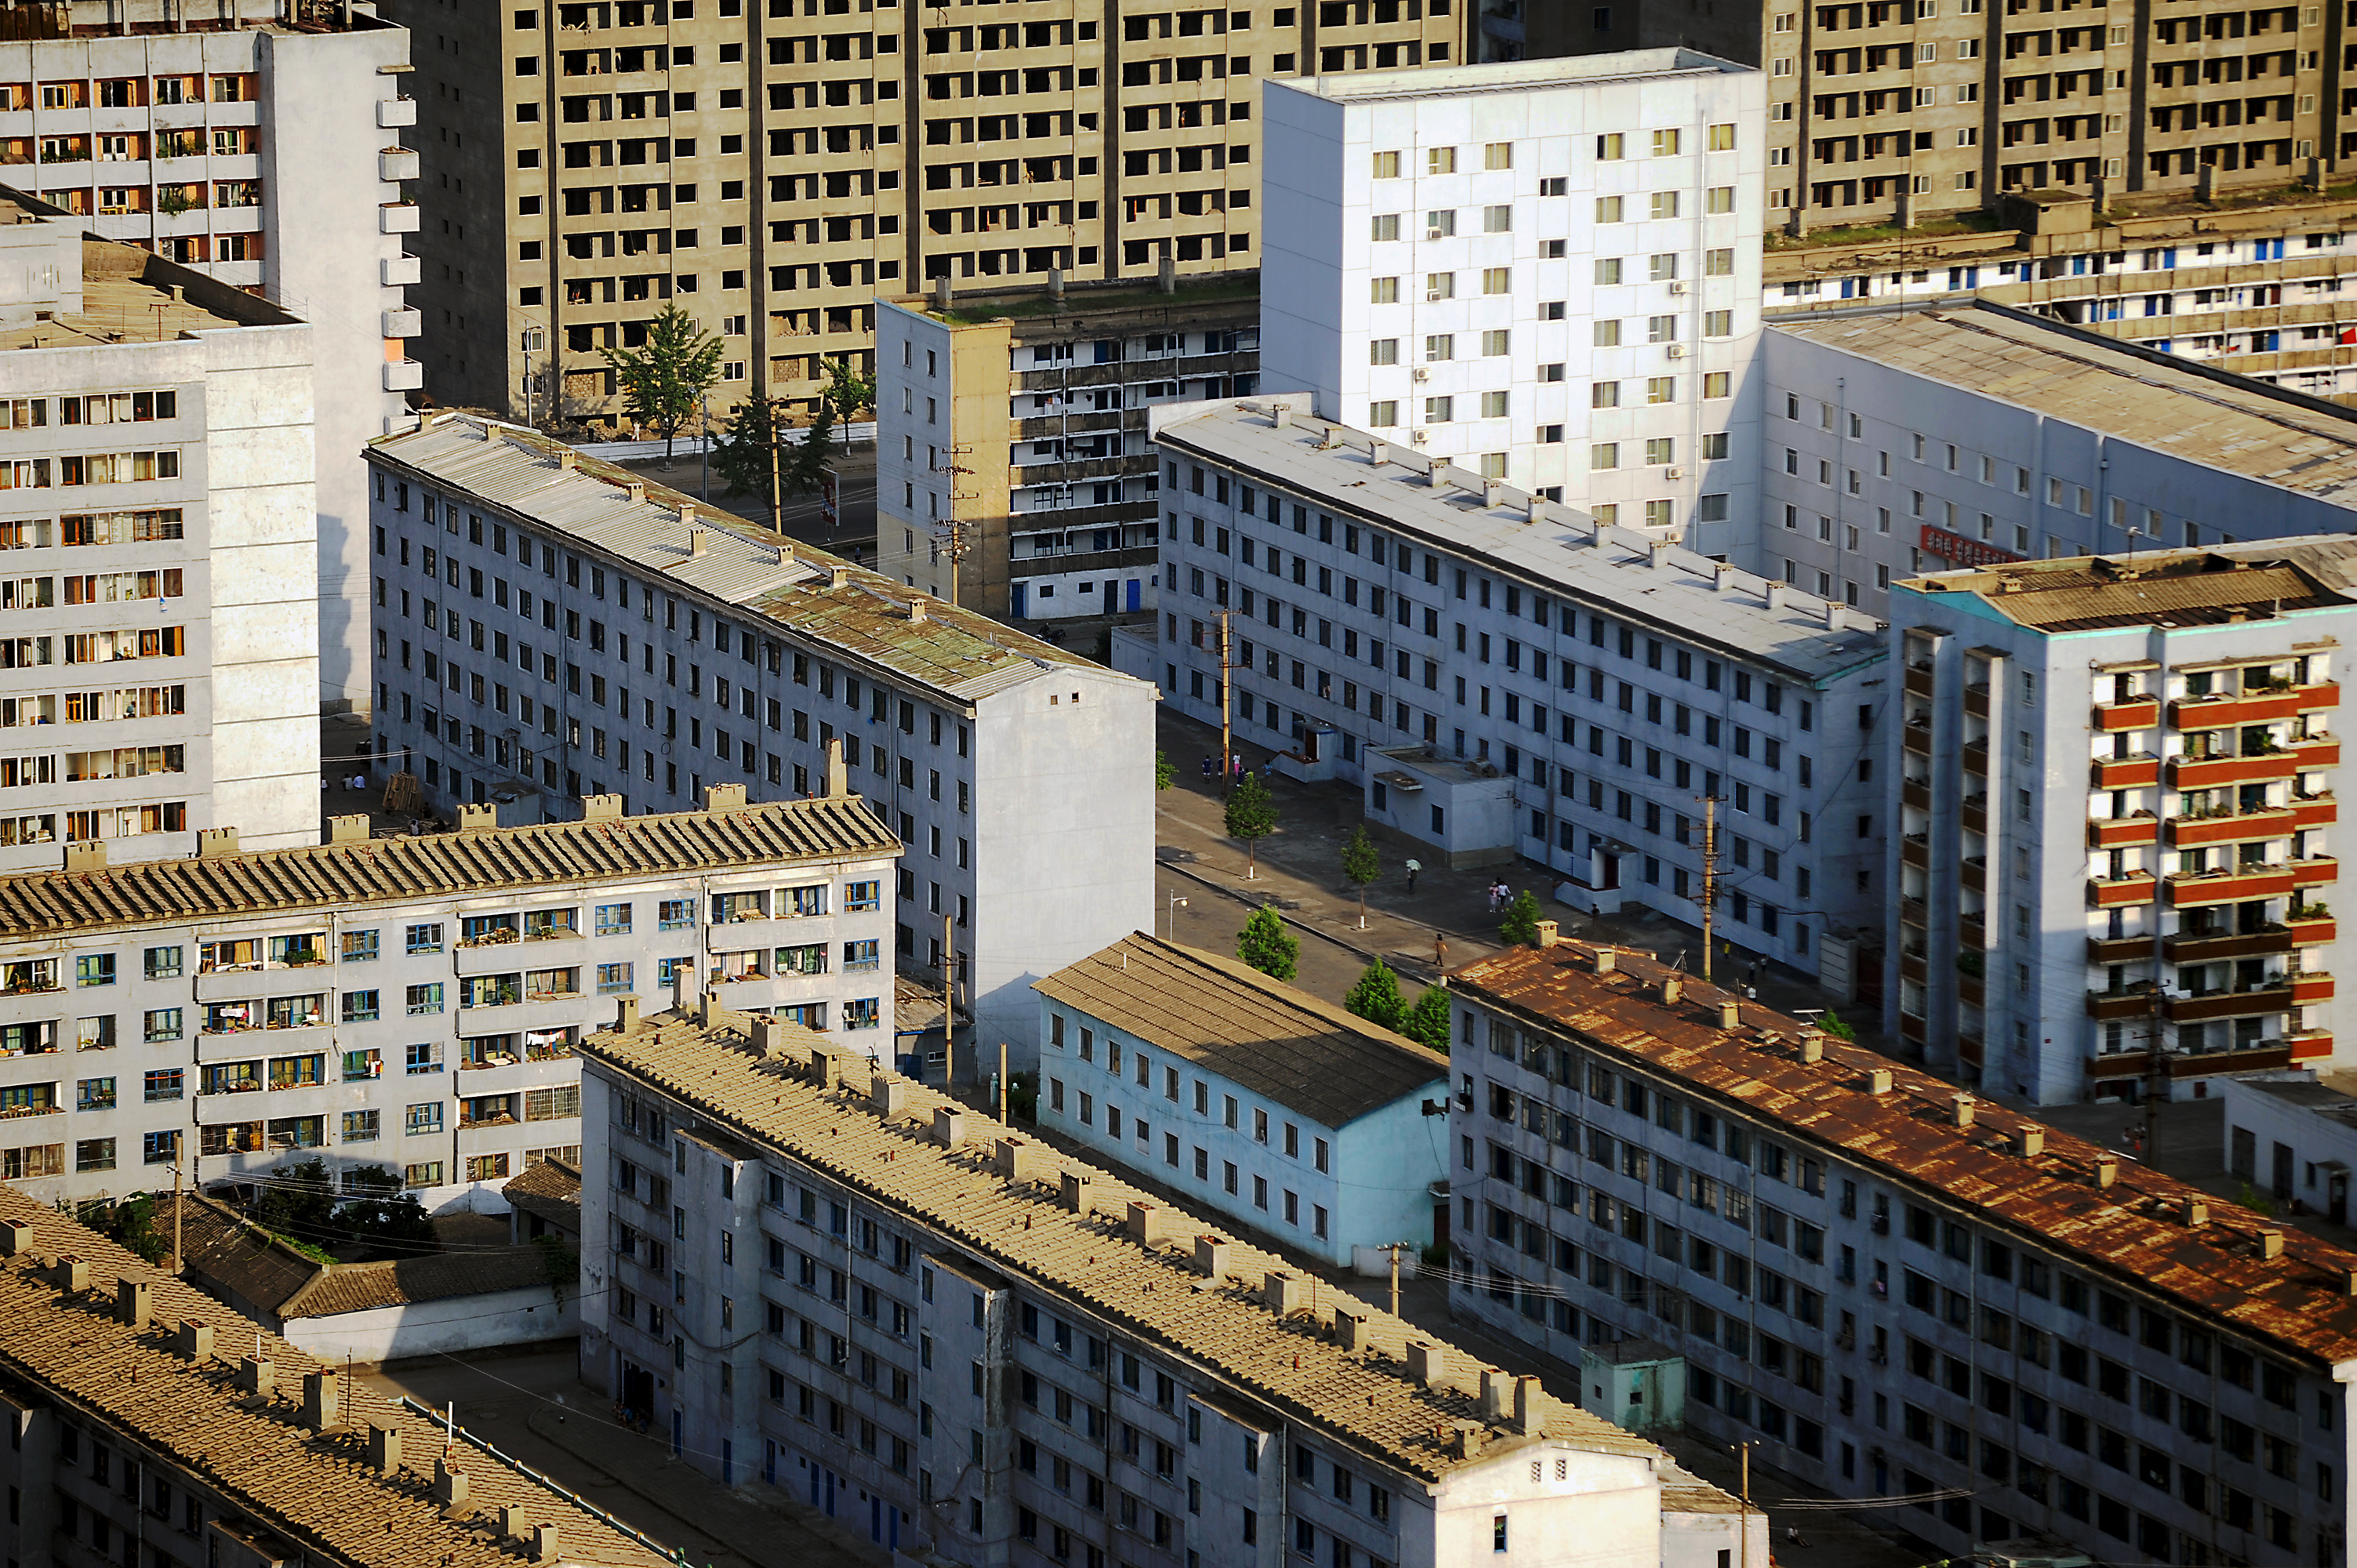 Behind The Veil A Rare Look At Life In North Korea Cnn Travel